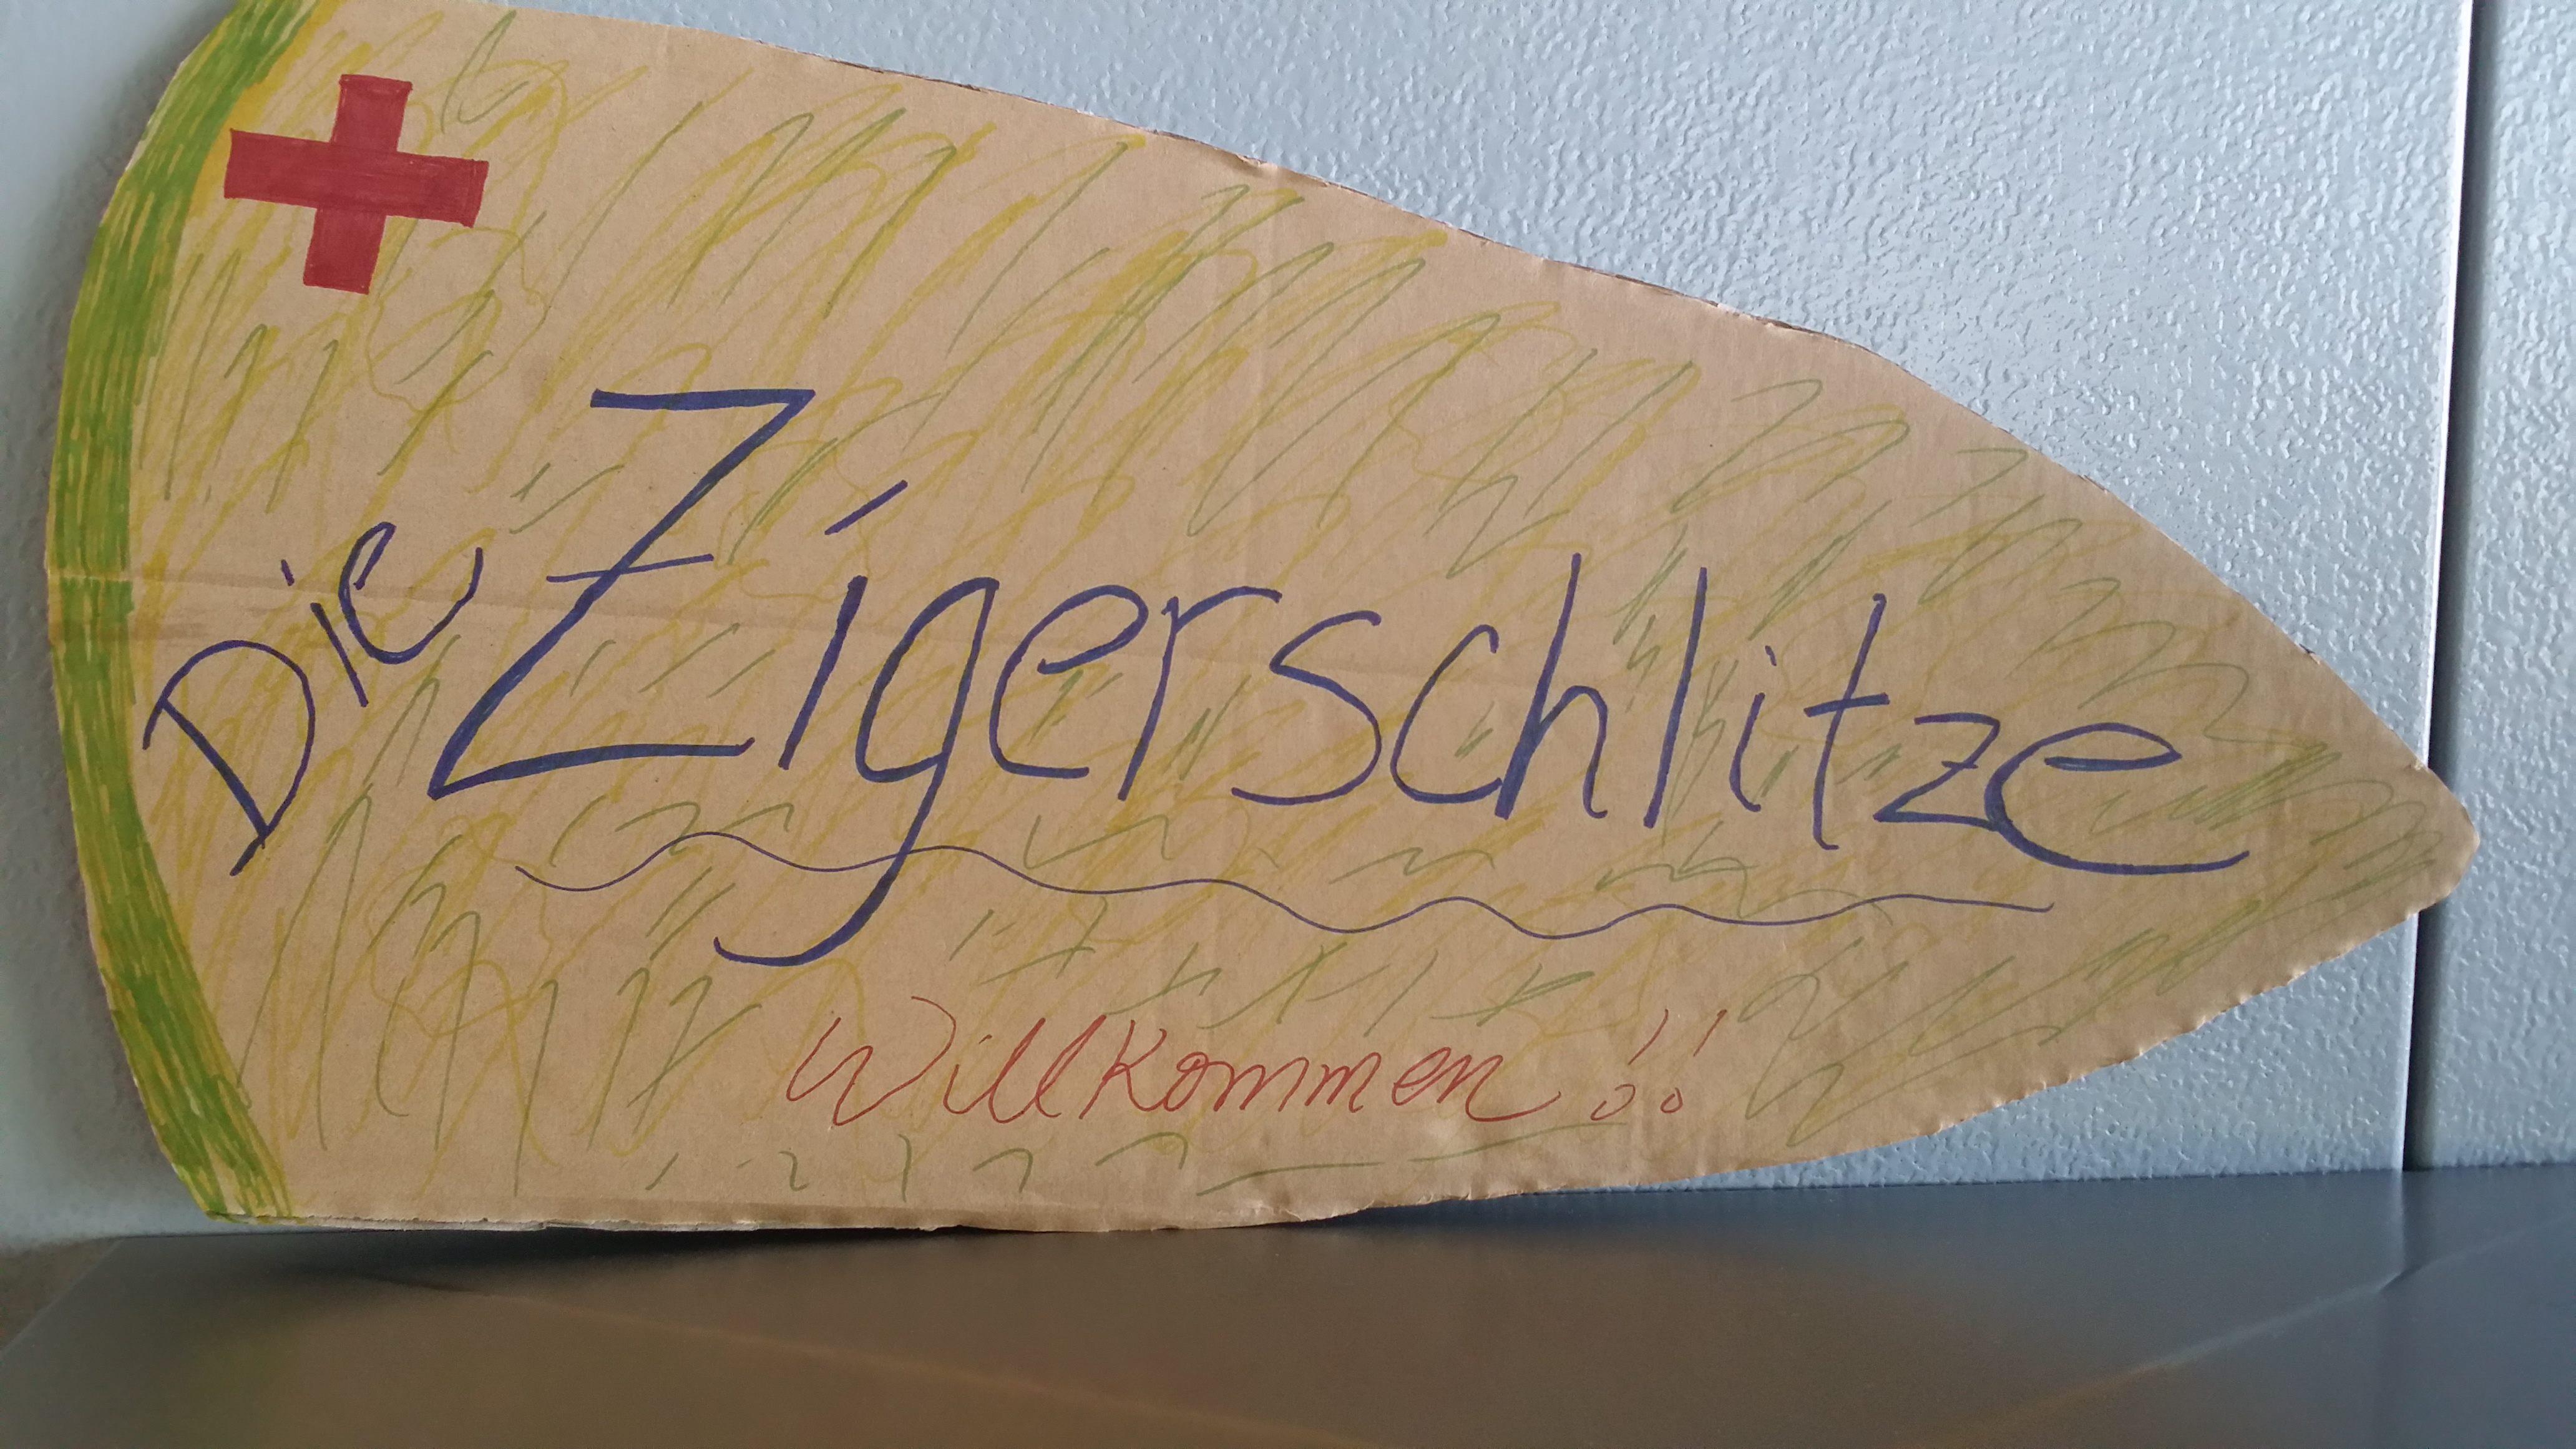 Zigerschlitze